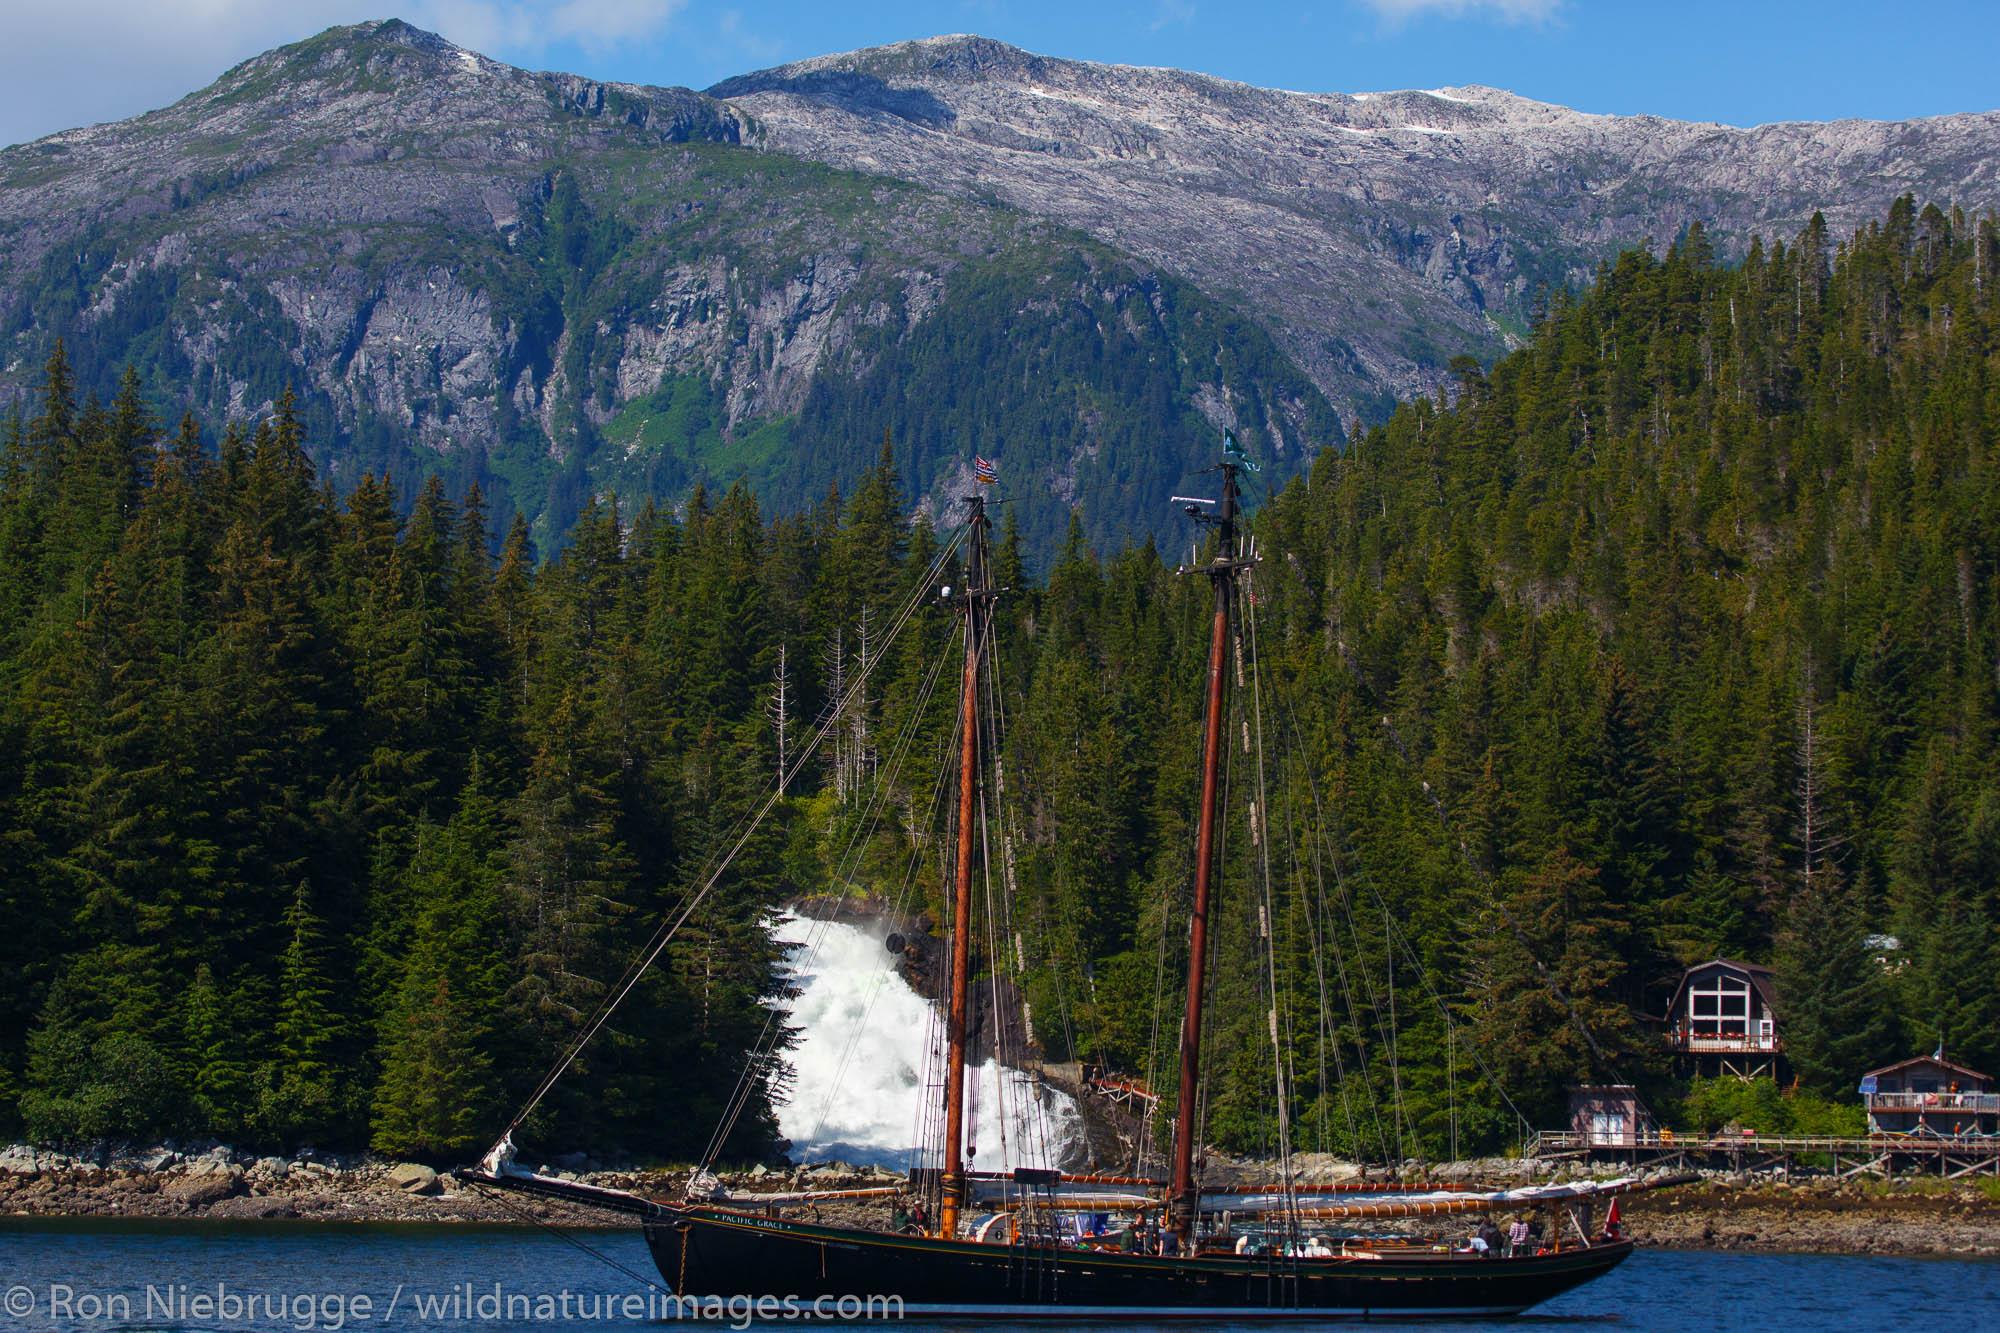 Sailing ship in Warm Springs Bay, Baranof Island, Tongass National Forest, Alaska.